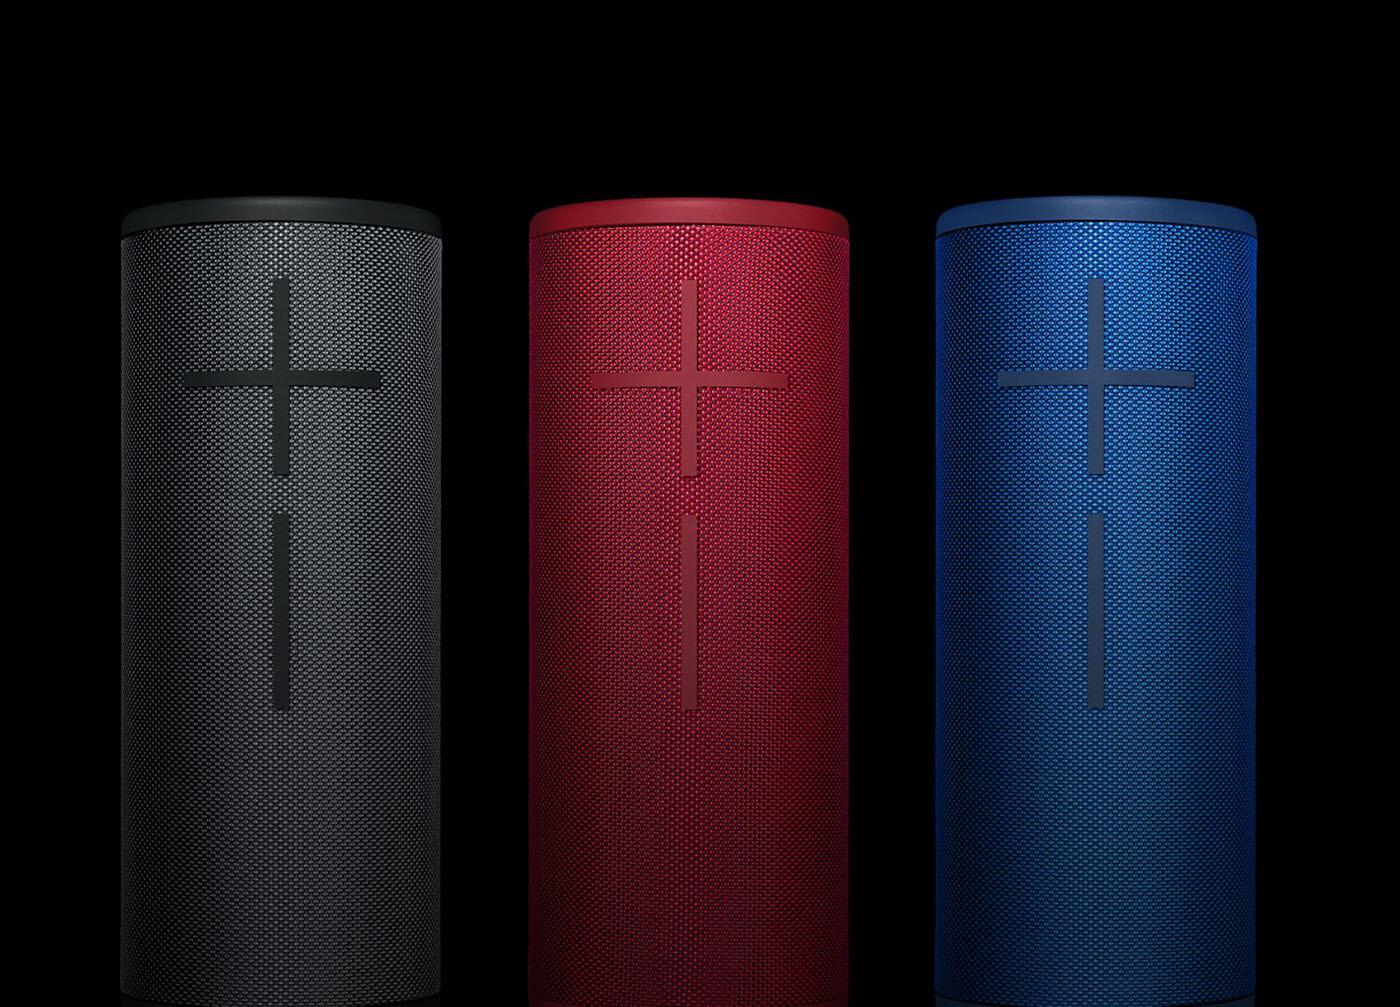 Best Bluetooth speakers this year - PhoneArena